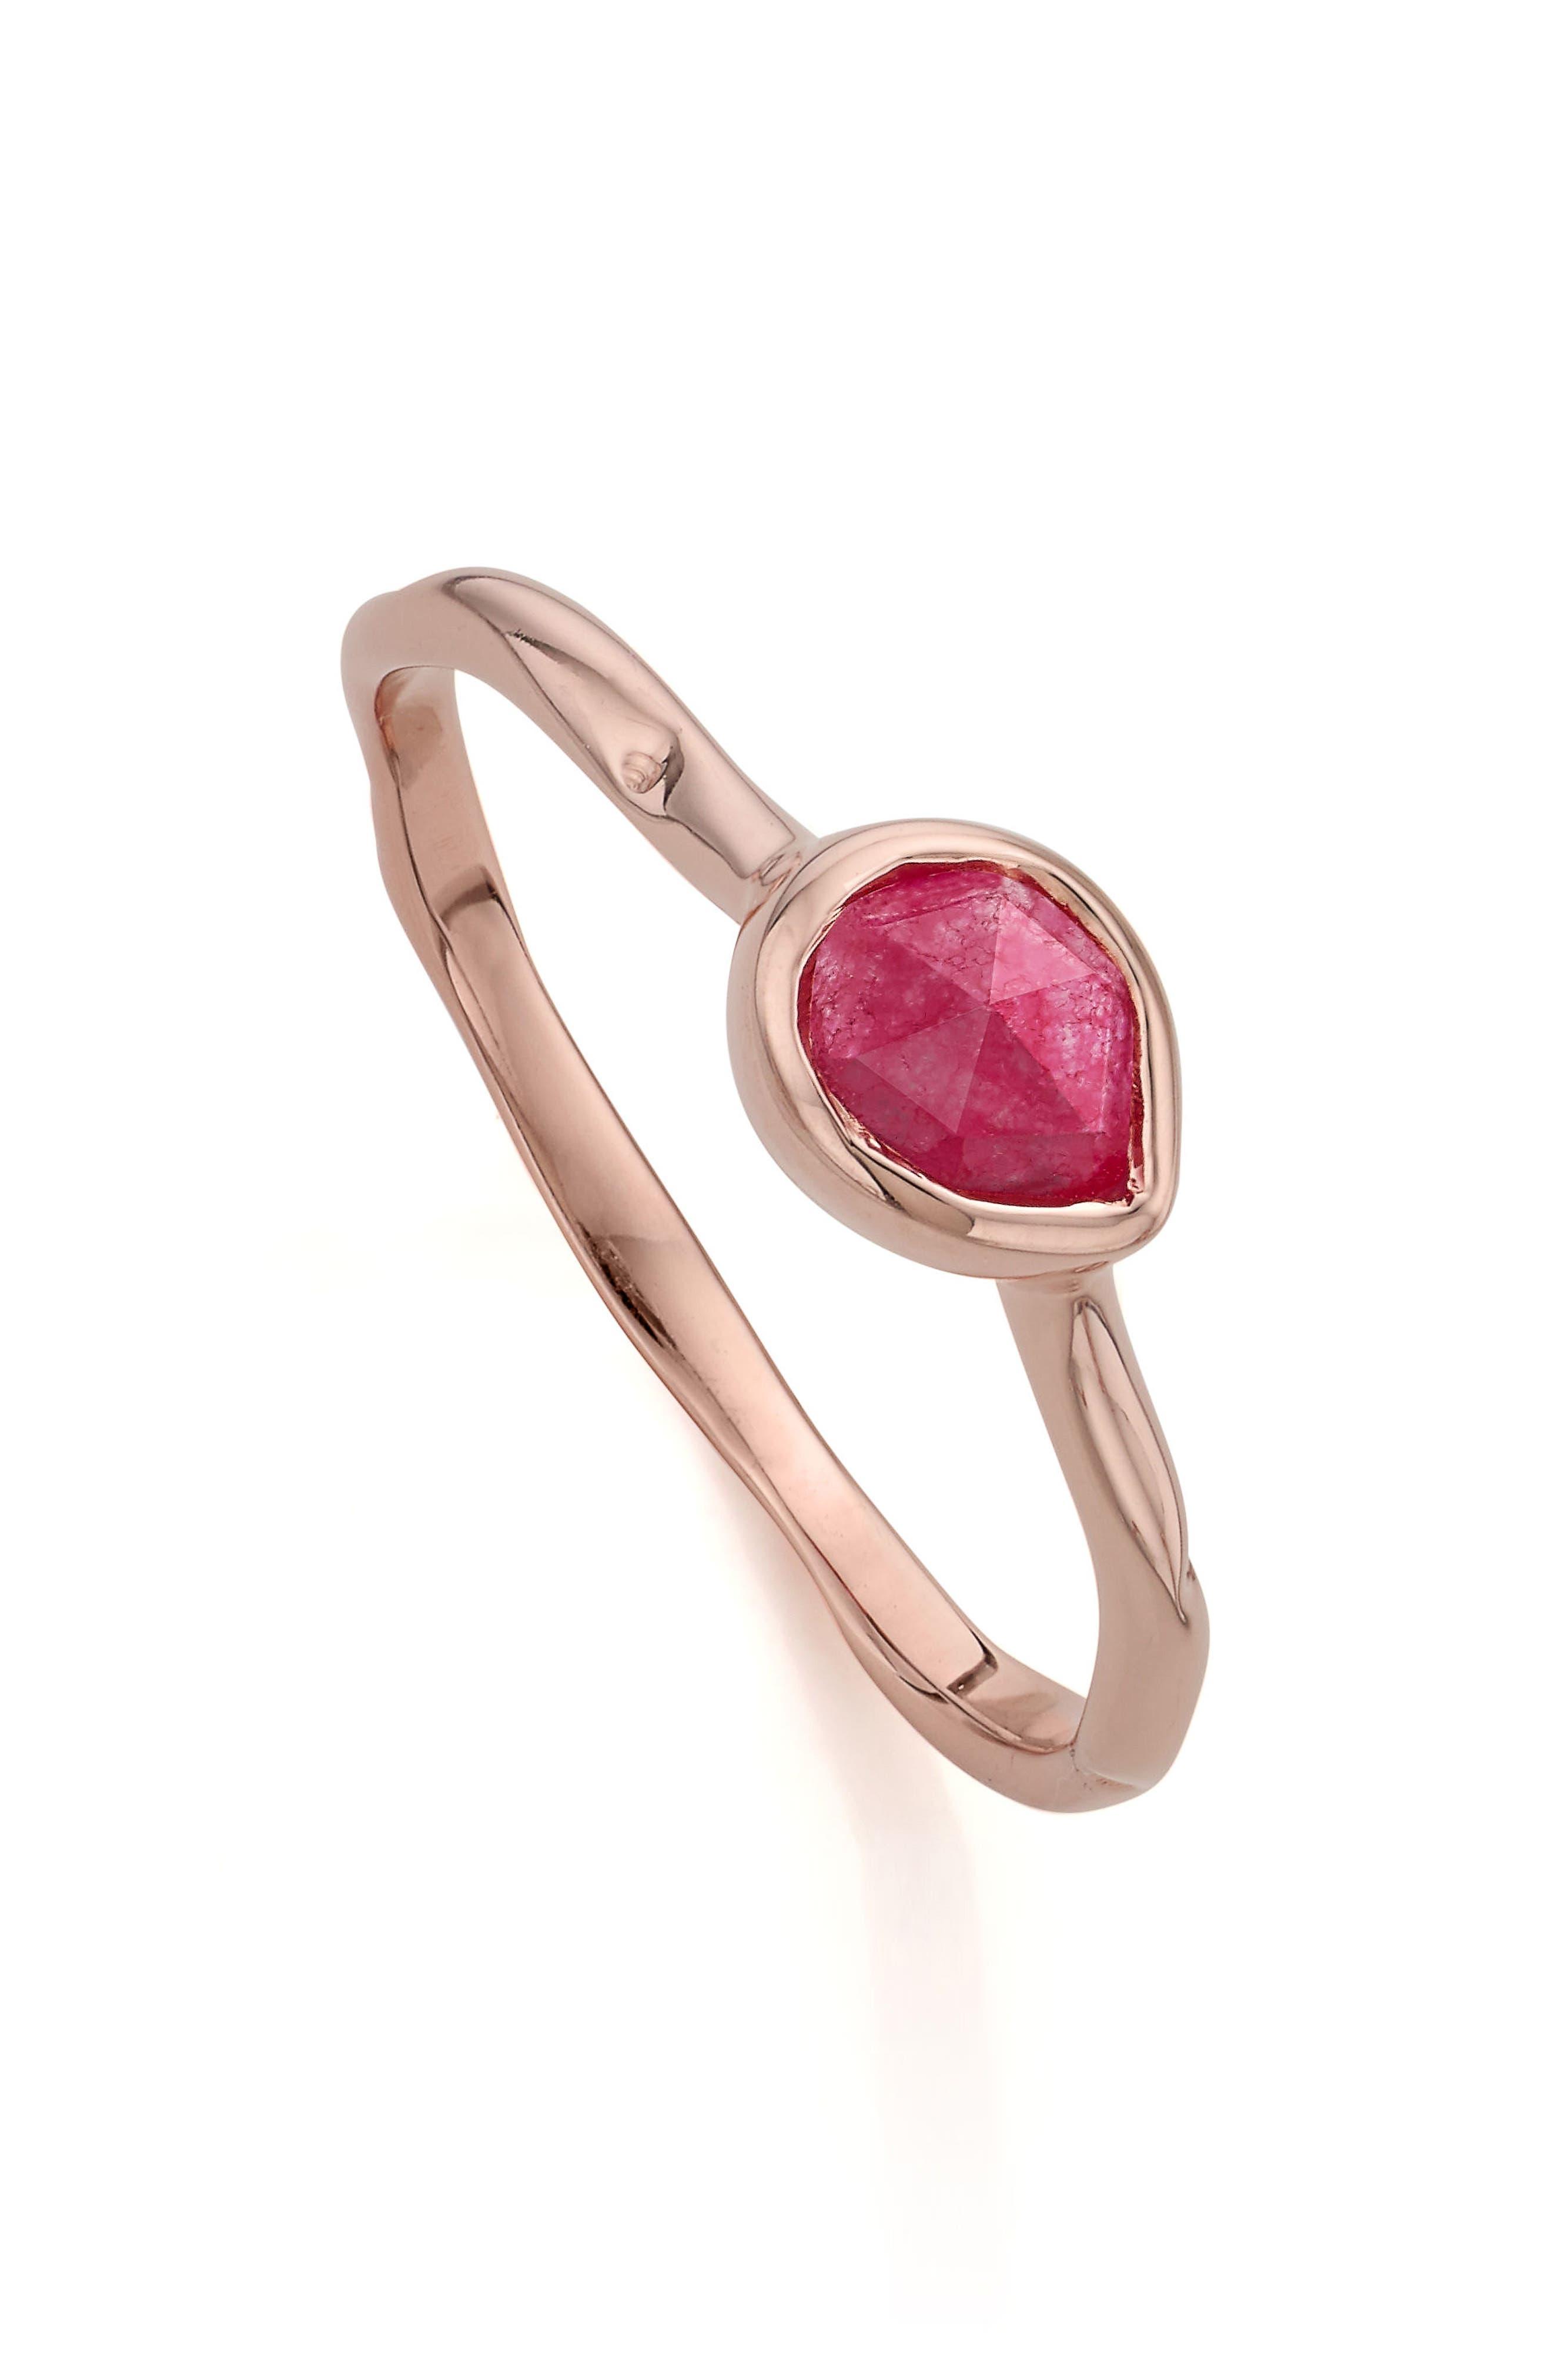 'Siren' Small Stacking Ring,                             Alternate thumbnail 2, color,                             PINK QUARTZ/ ROSE GOLD